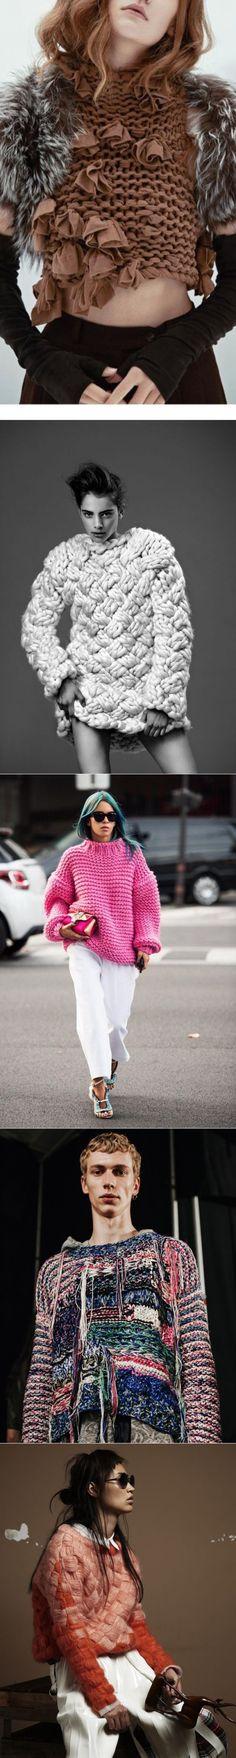 "100 ideias de moda: camisola da temporada ""Outono-Inverno"" 2017-2018 year photo"